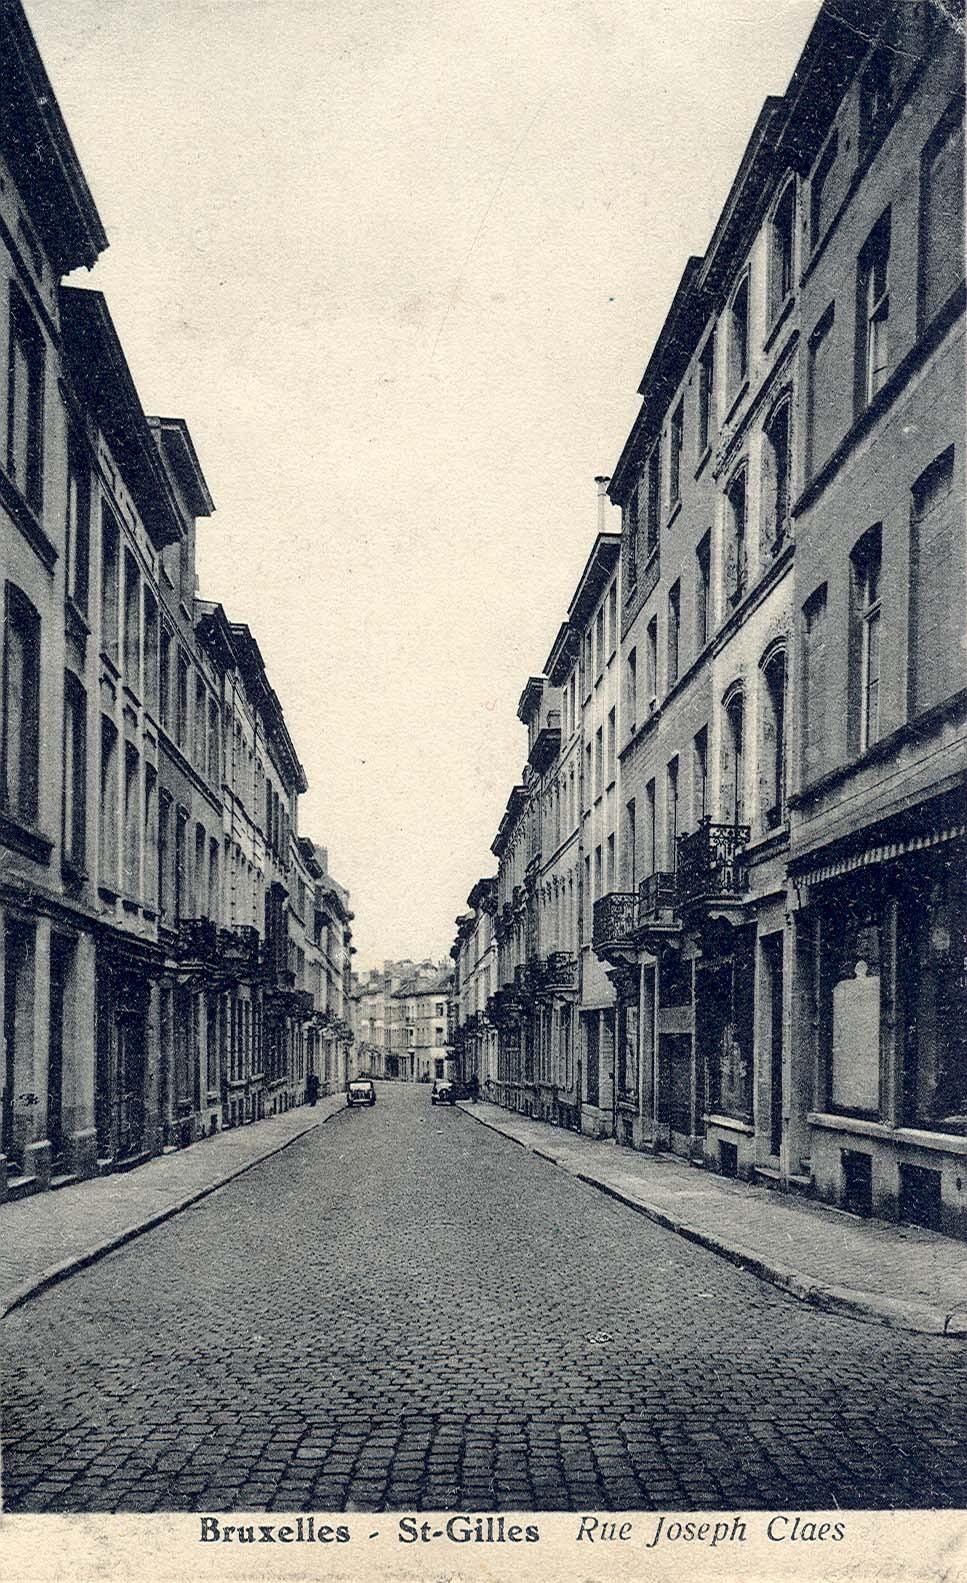 Rue Joseph Claes (Collection de Dexia Banque, 1949).